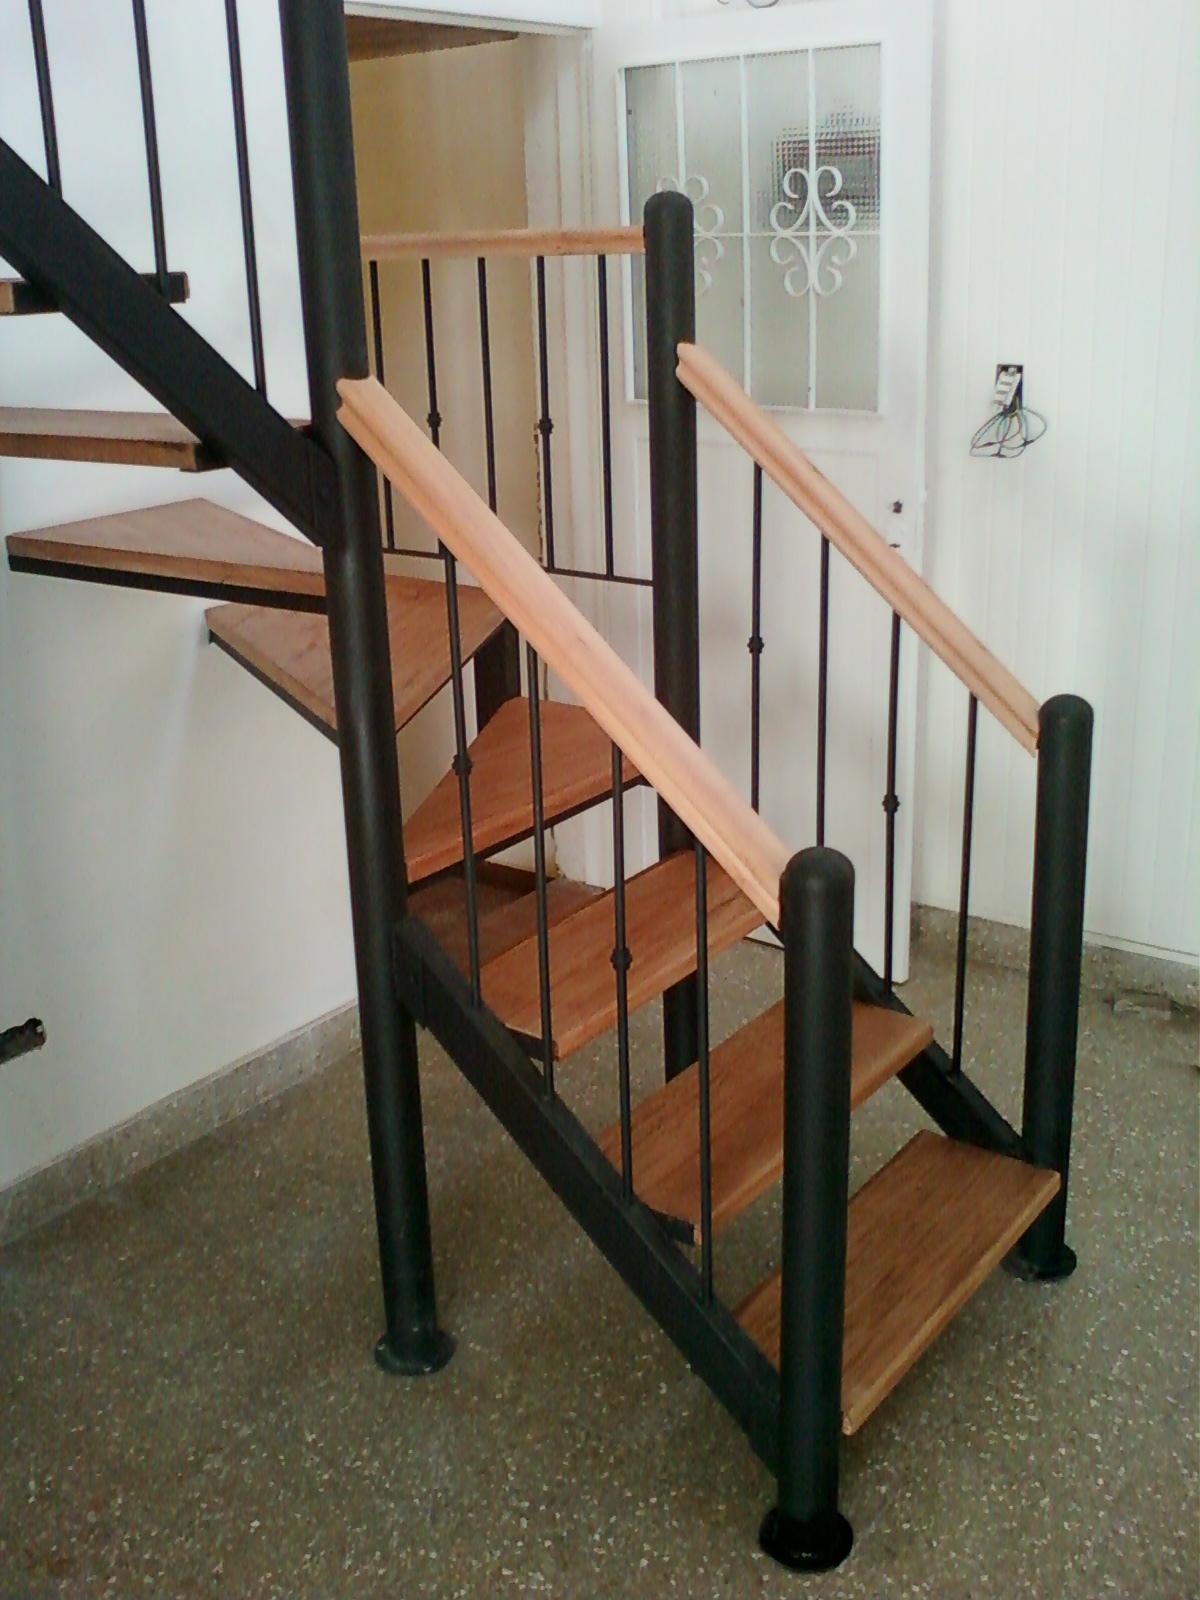 Rodr guez e hijo herrer a y carpinter a de obra for Escaleras de madera sencillas